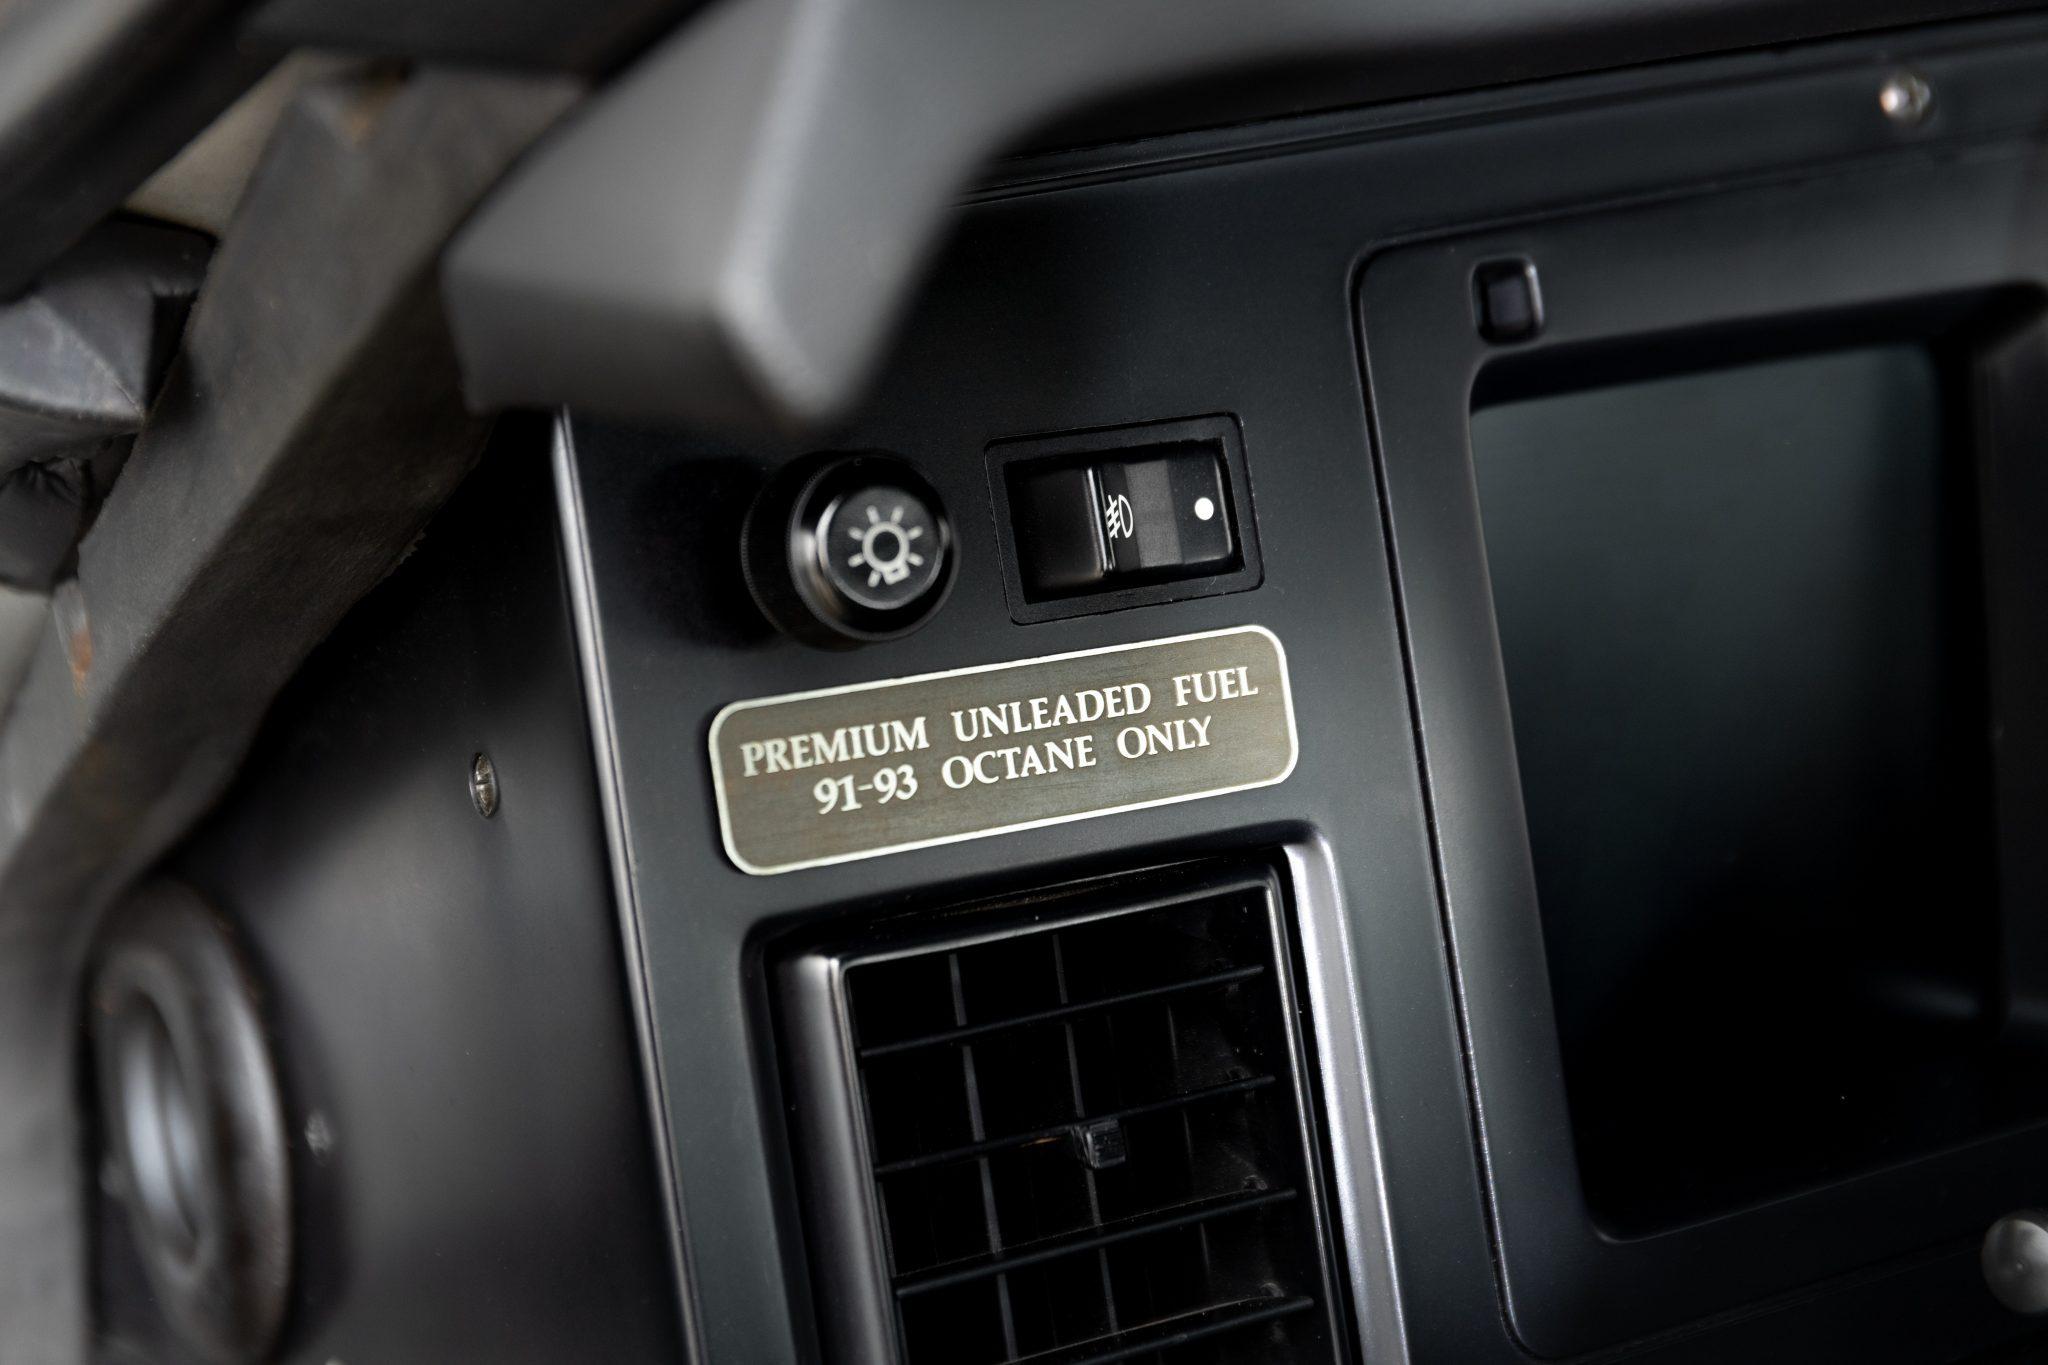 1988 Chevrolet Corvette Callaway SledgeHammer BaT interior fuel